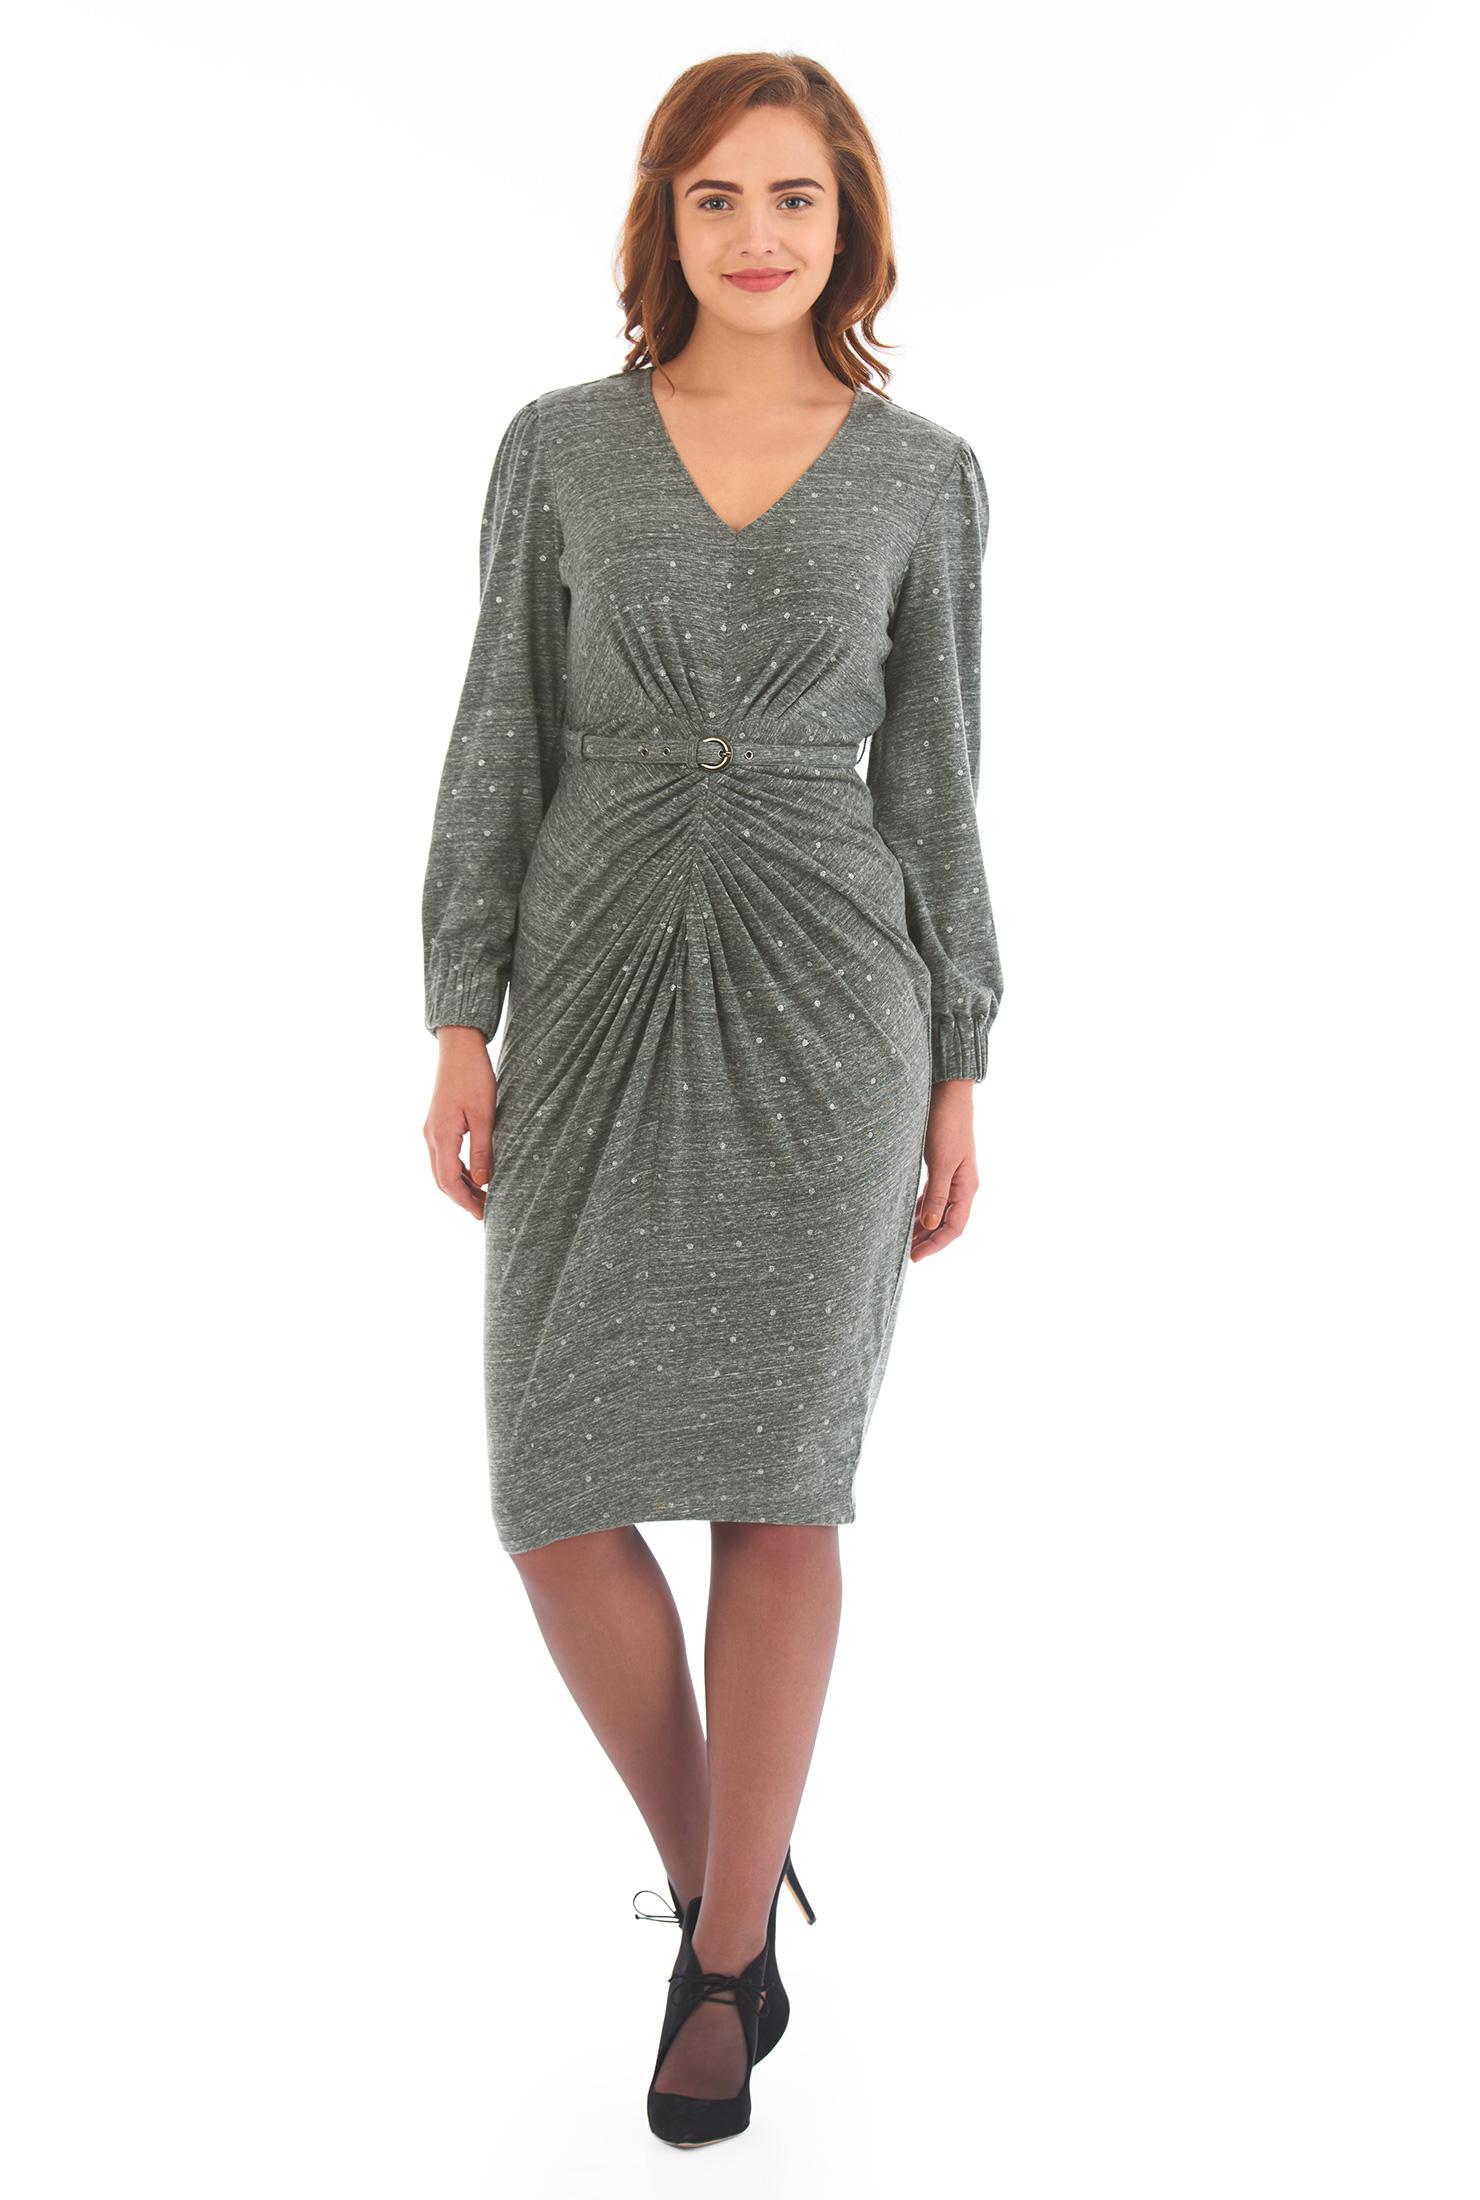 Eshakti Womens Ruched Silver Dot Melange Knit Sheath Dress